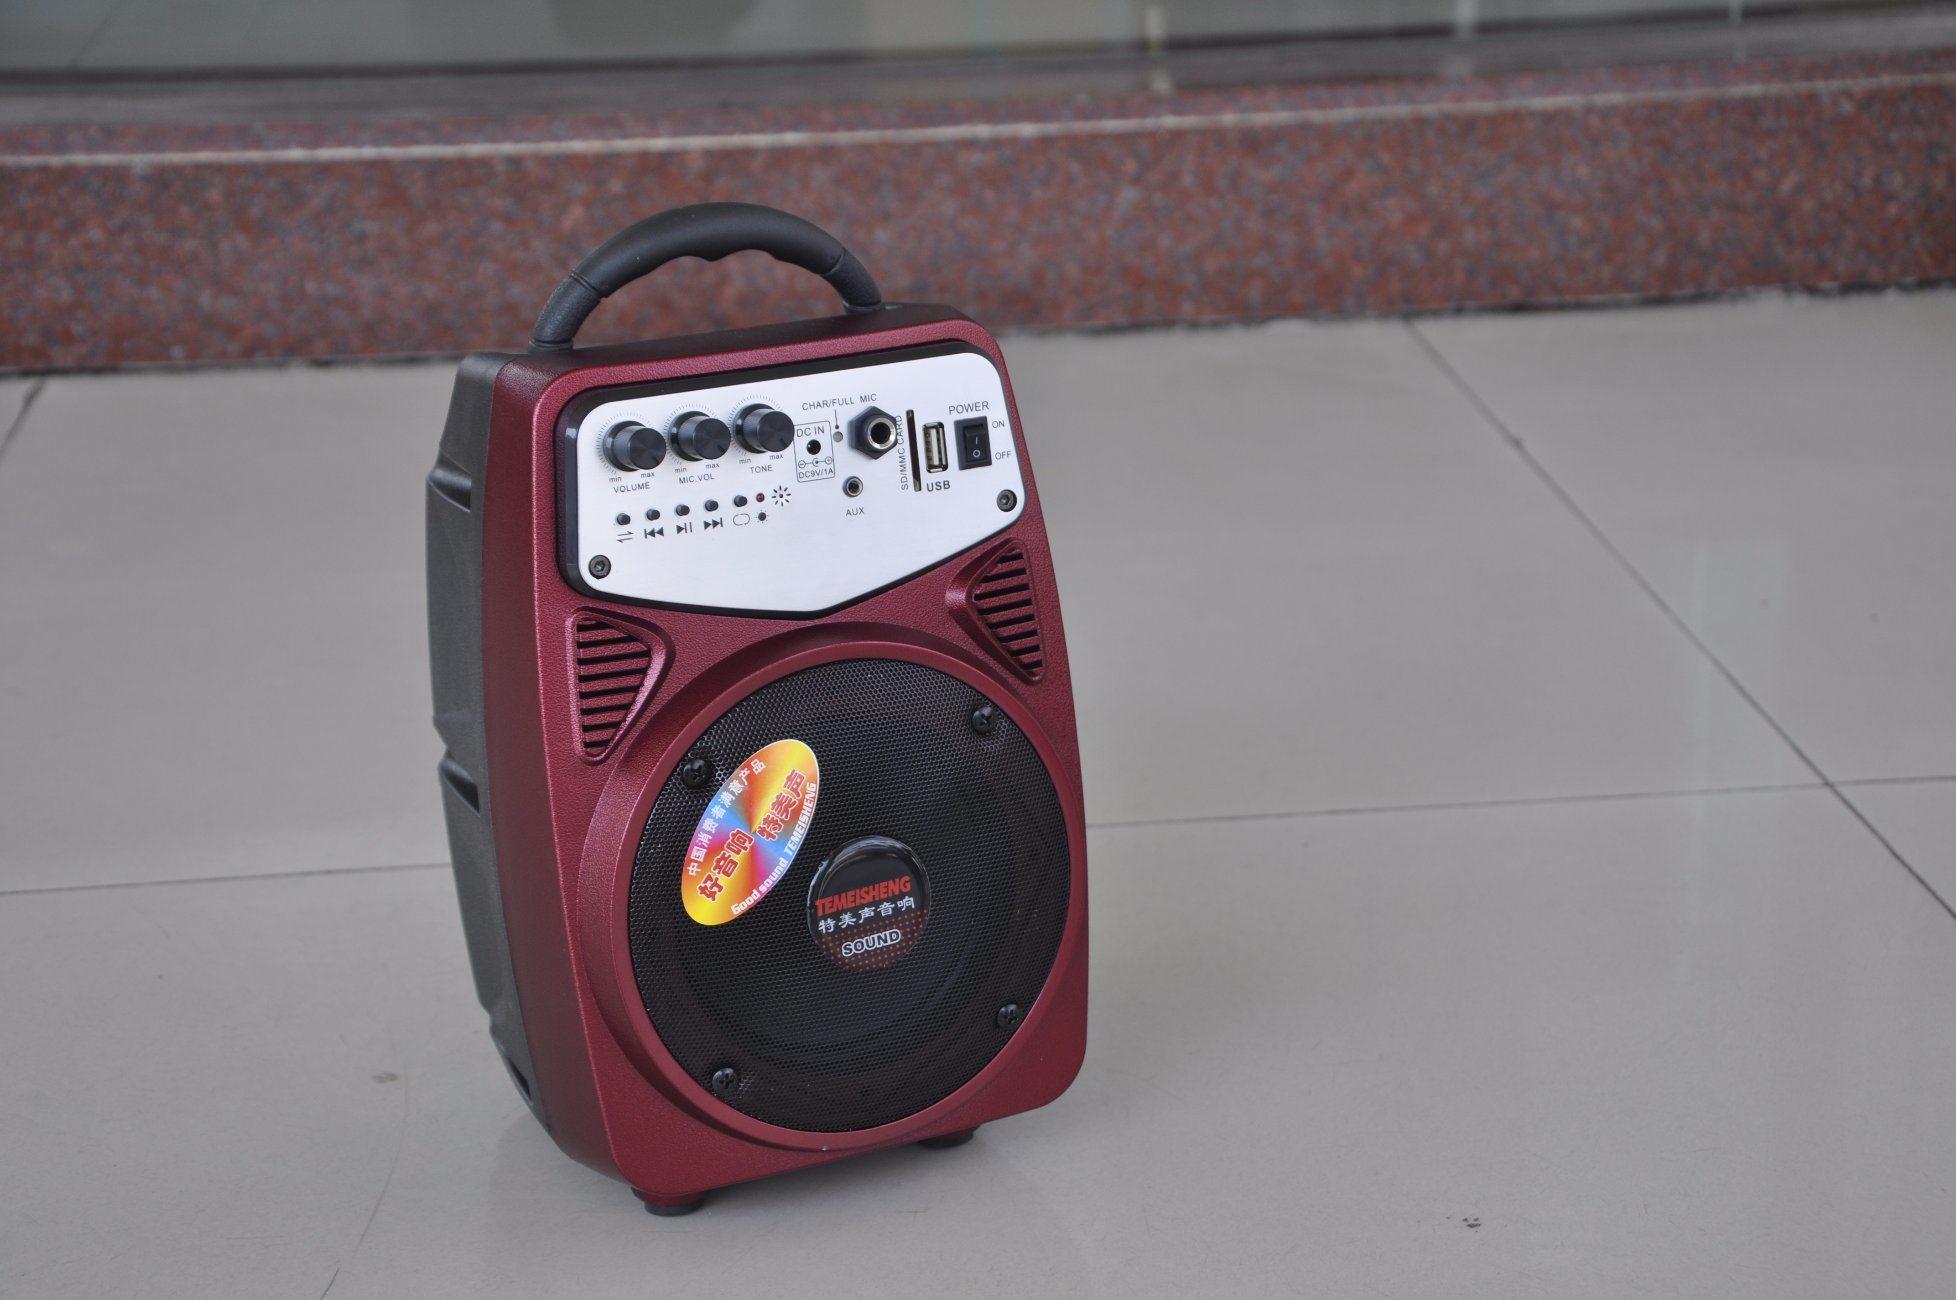 Feiyag/Temeisheng Portable Mini Speaker with SD Card Slot and HiFi Bass Vibration Speaker for Outside Using Q2